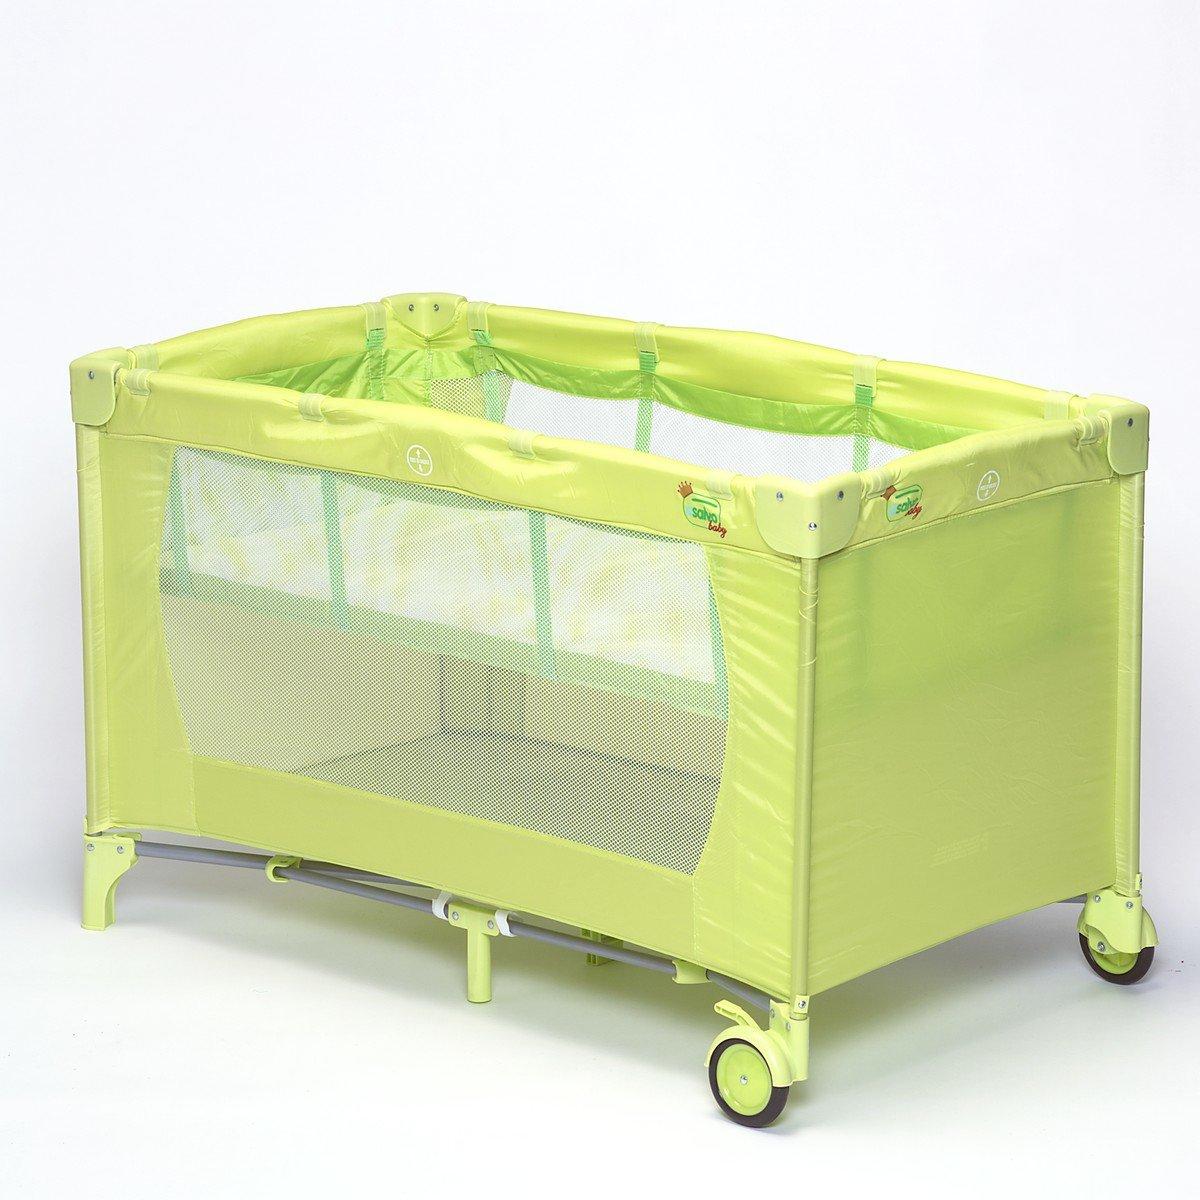 Campingbedje Lime Groen.Bol Com Titaniumbaby Campingbed Lime